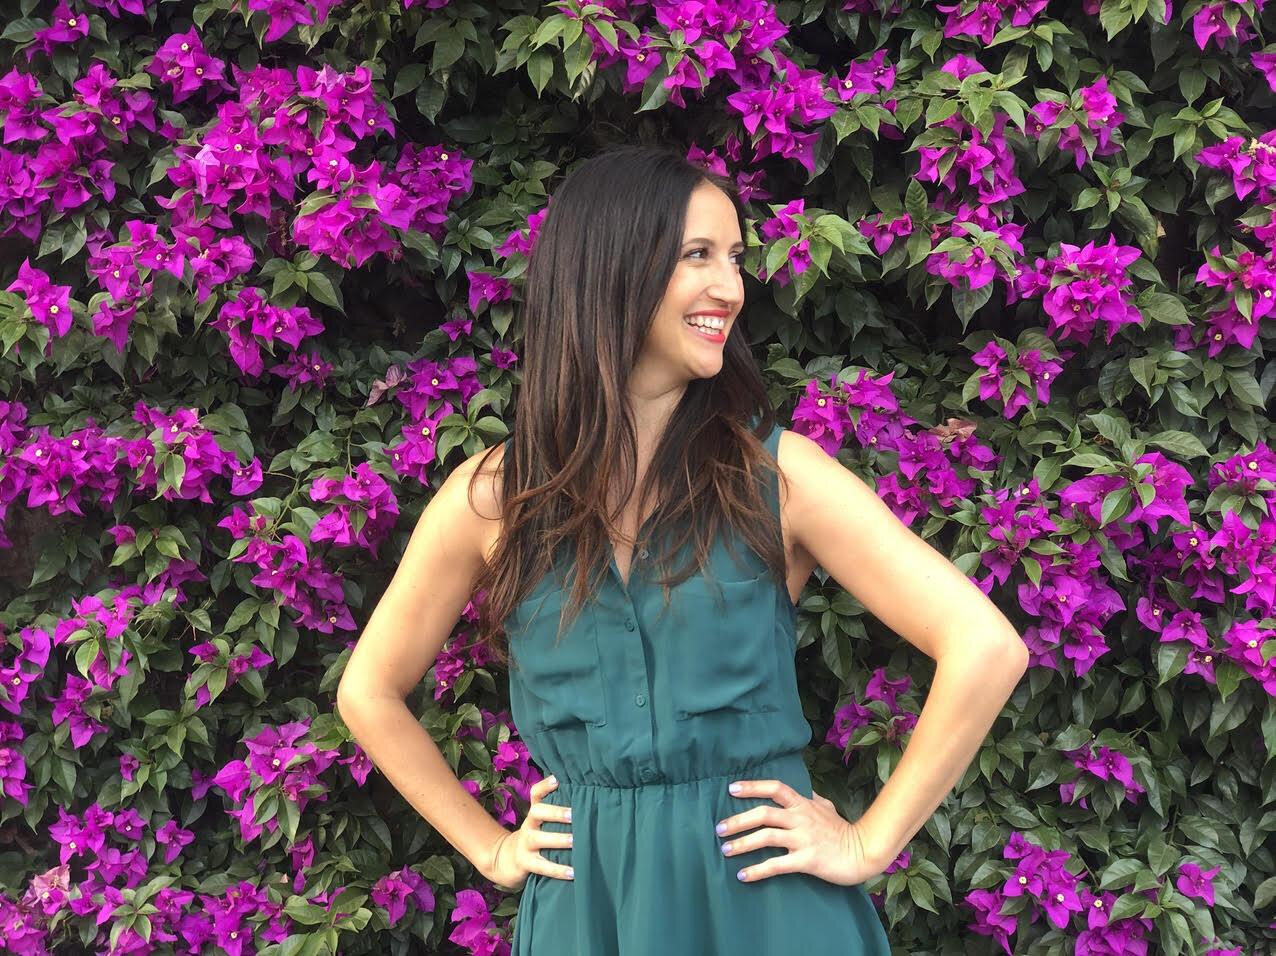 beste dating apps Quebec Vincent van Driel dating clip